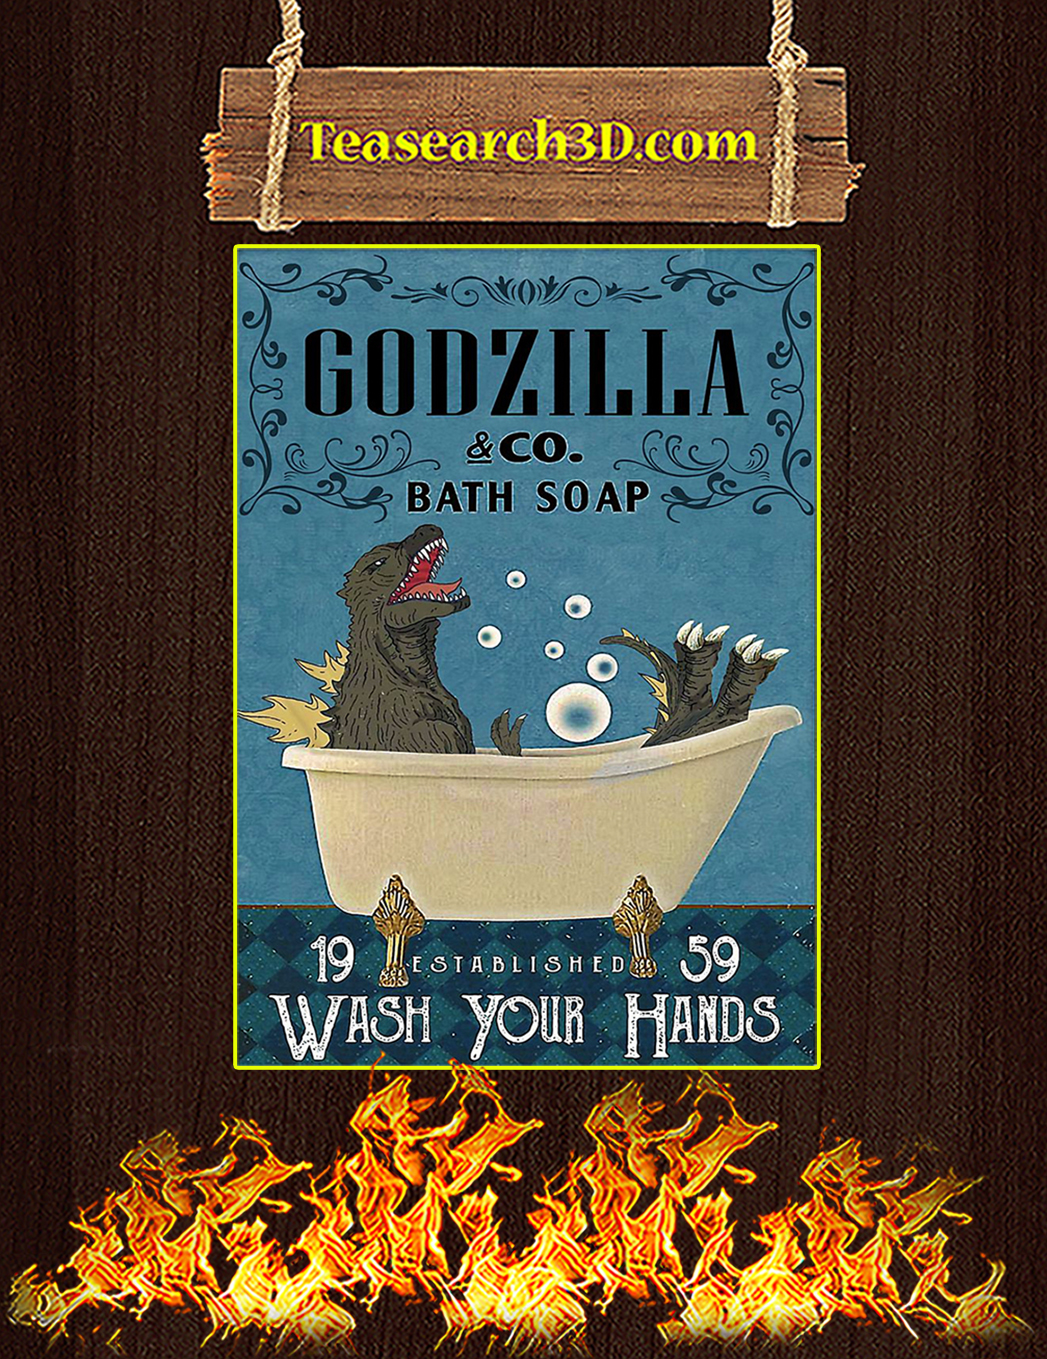 Godzilla co bath soap wash your hands poster A1